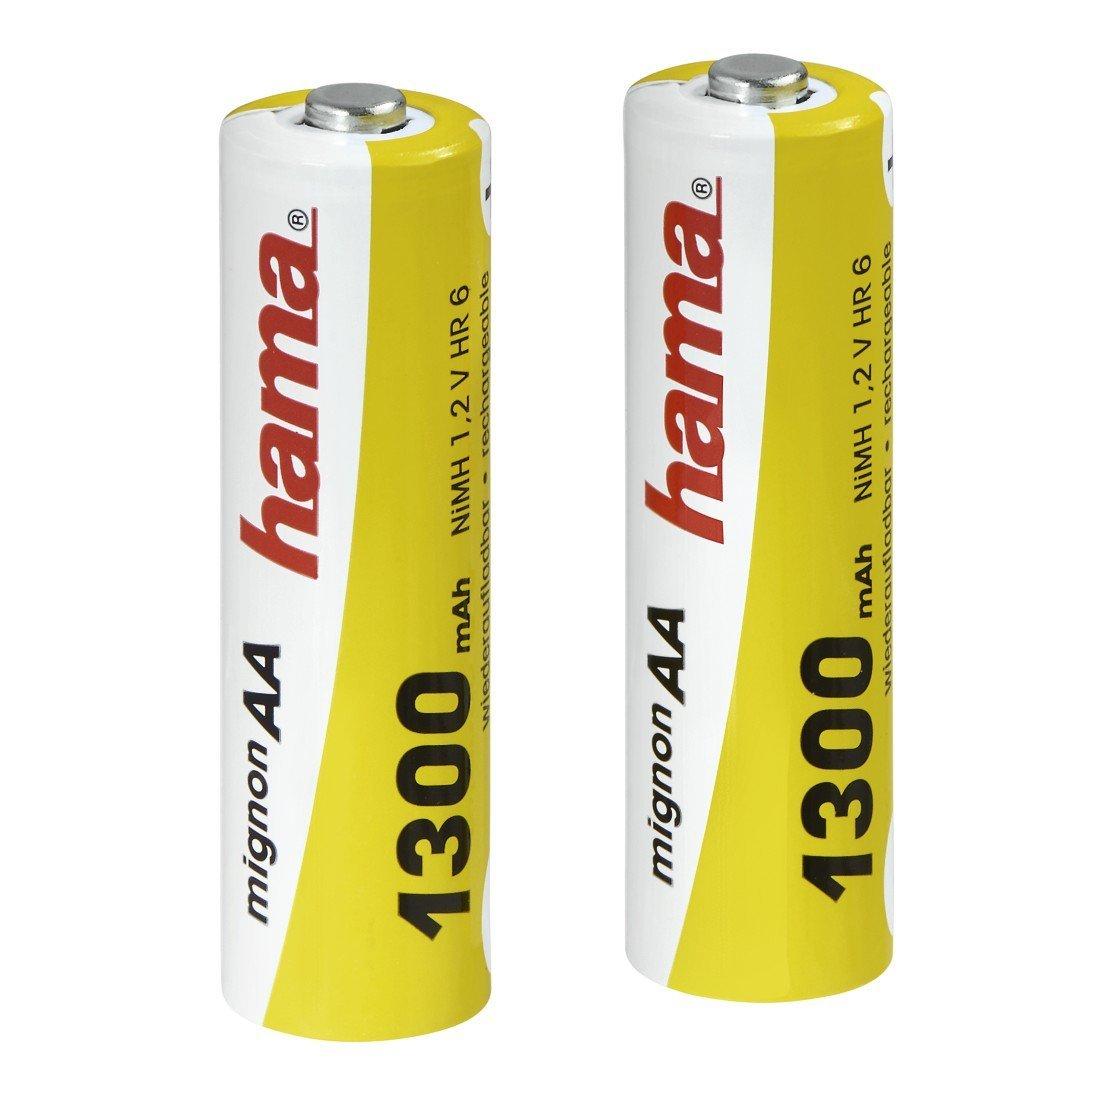 Hama NiMH Battery 2x AA (Mignon - HR 6) 1300 mAh Nichel-Metallo Idruro (NiMH) 1300mAh 1.2V batteria